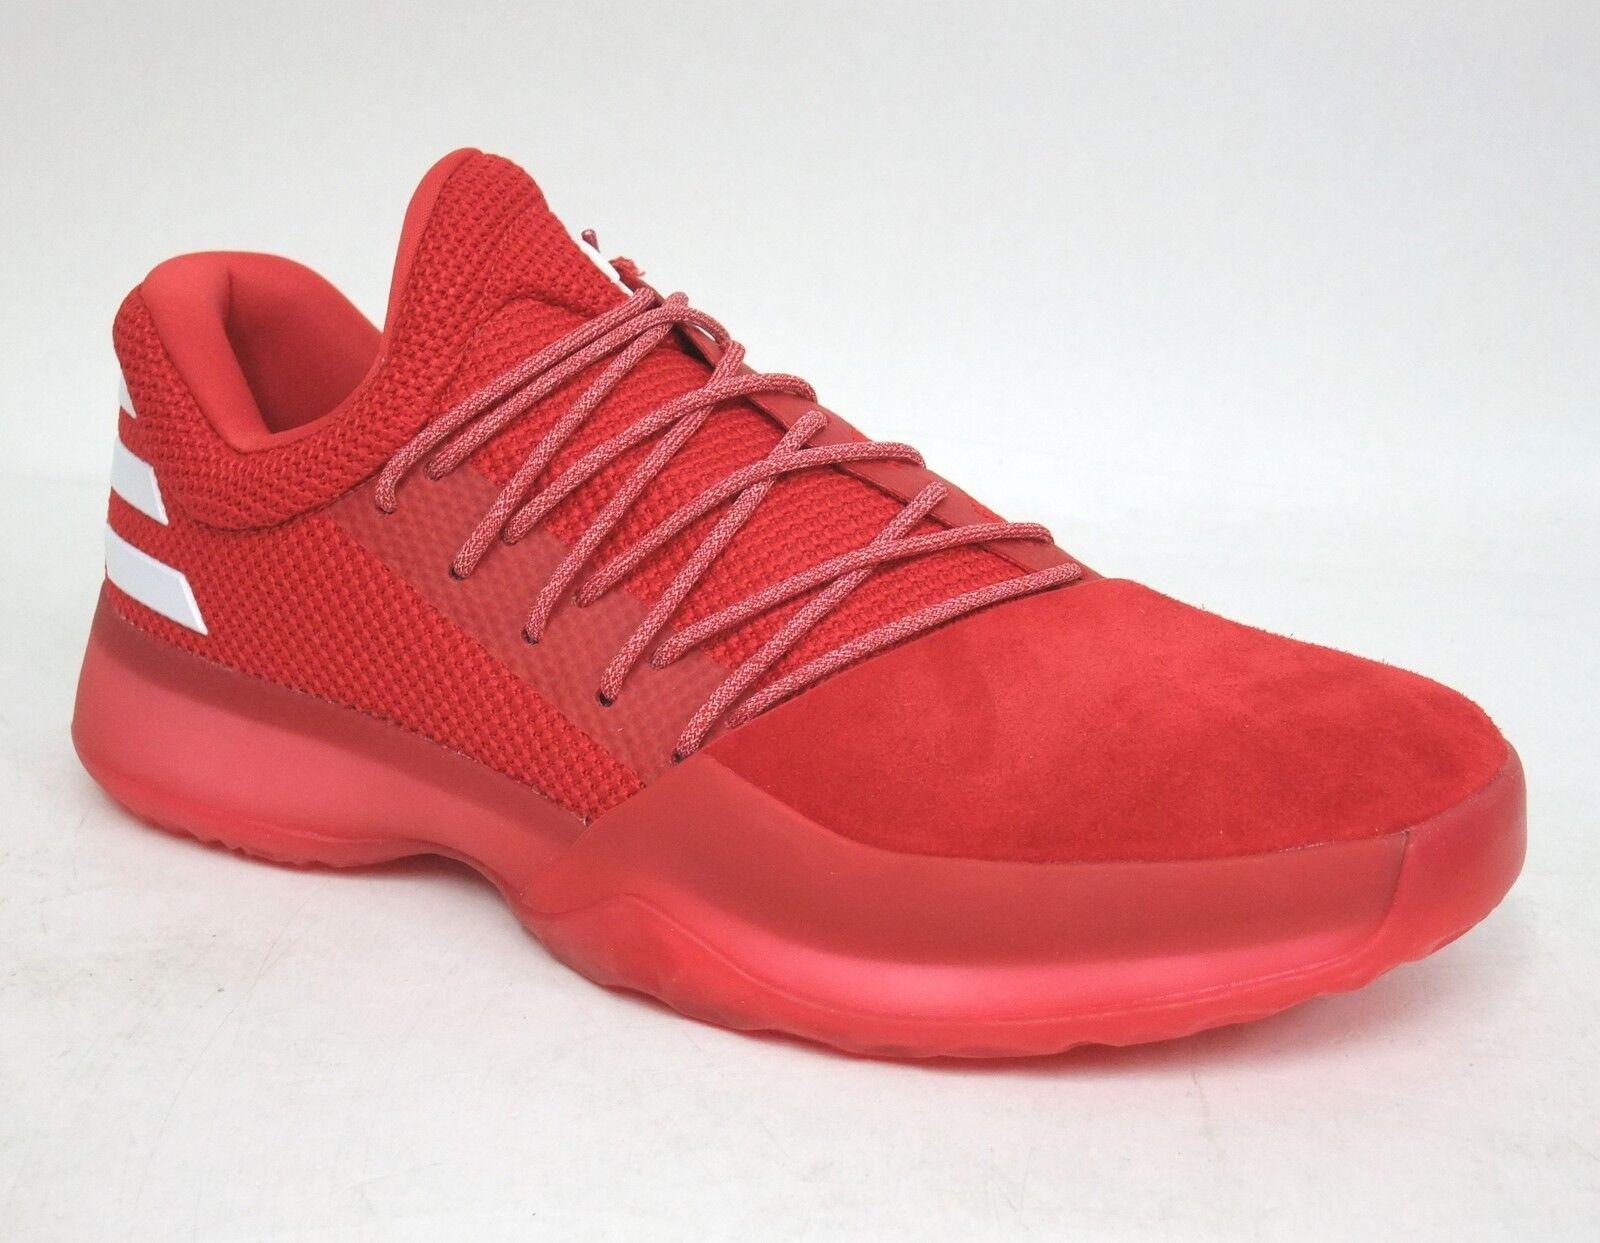 ADIDAS Basketball-Schuhe HARDEN Vol. 1 scarlet Gr. 42 2 3 (US 9   UK 8,5)  NEU      Discount